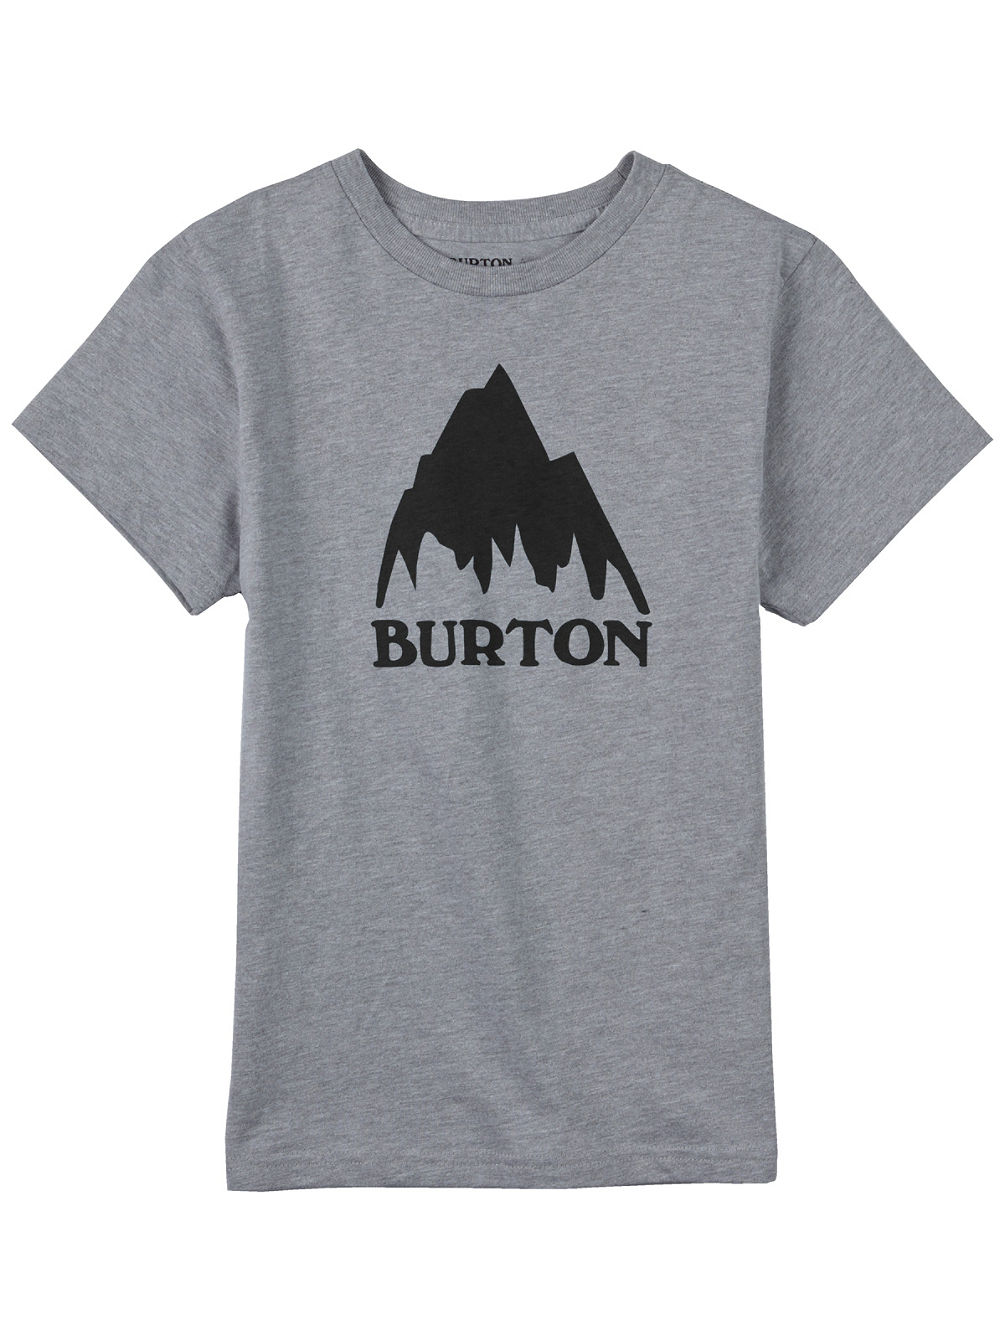 burton classic mountain t shirt jungen online kaufen bei blue. Black Bedroom Furniture Sets. Home Design Ideas